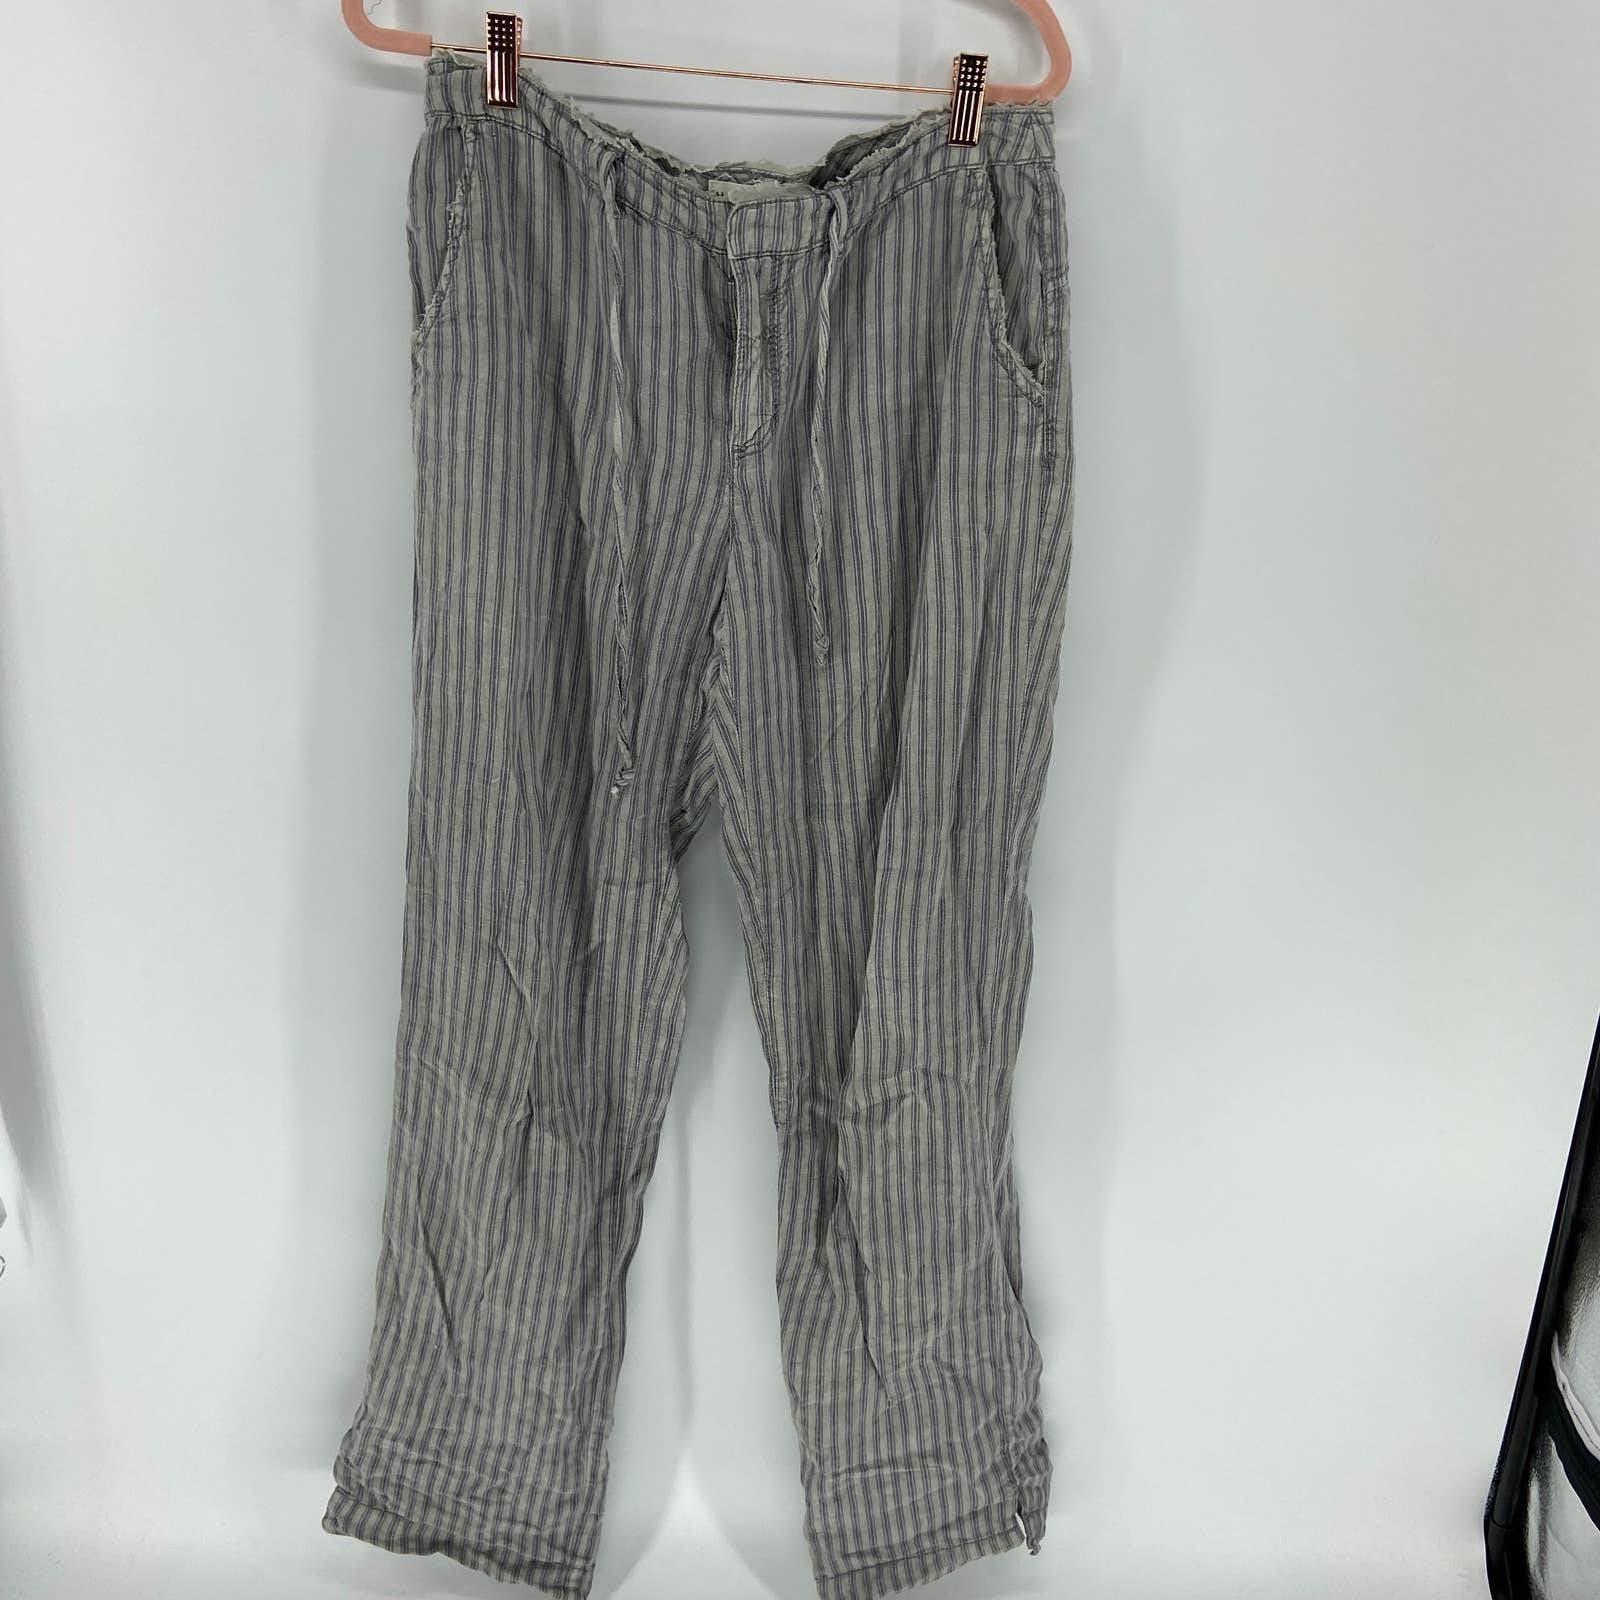 Marrakech Gray Striped Linen Pants